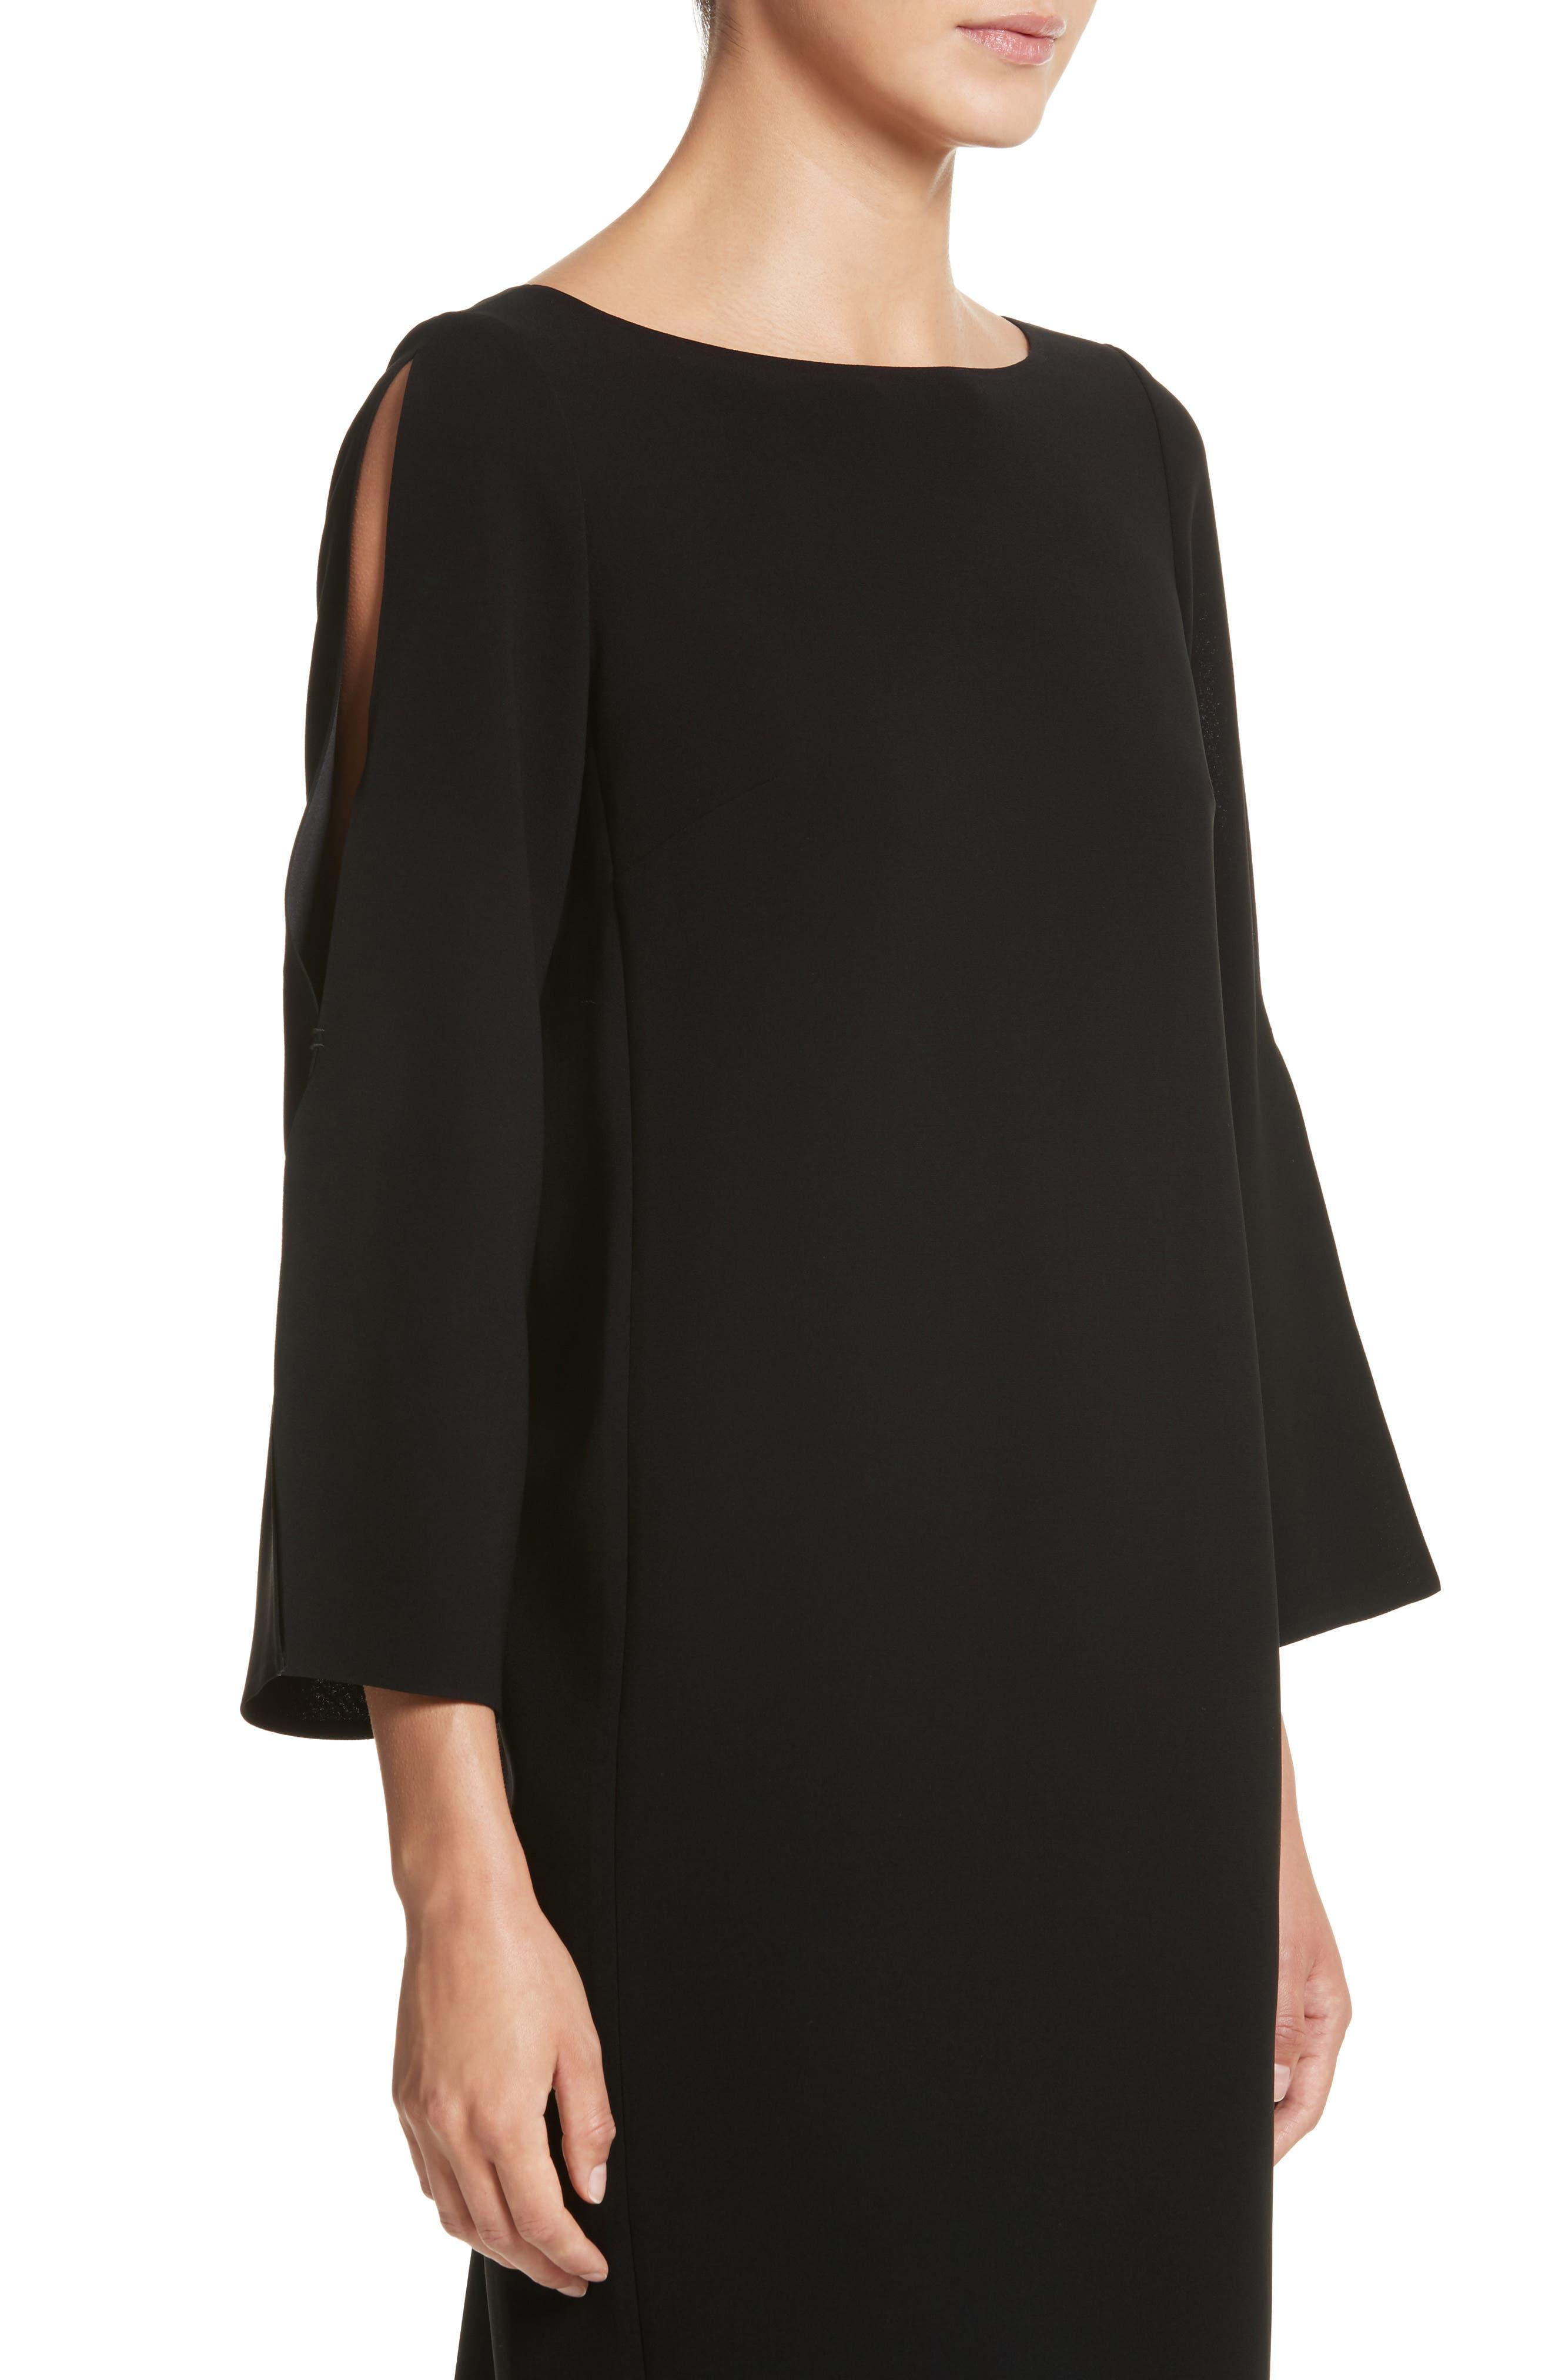 Candace Finesse Crepe Shift Dress,                             Alternate thumbnail 4, color,                             Black